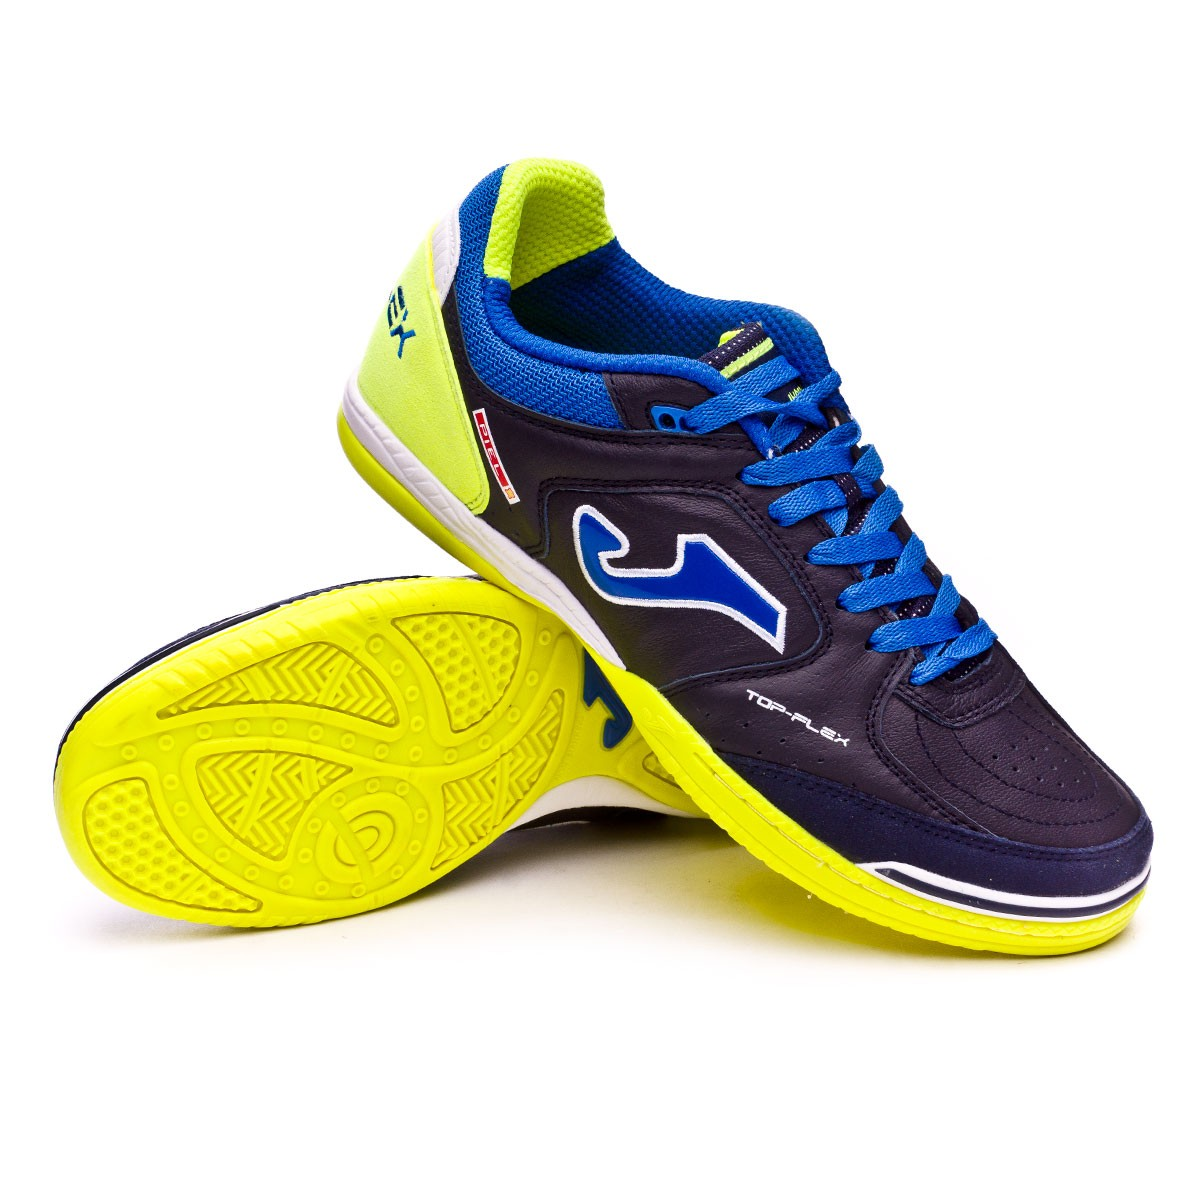 Futsal Boot Joma Top Flex Navy-Lime - Leaked soccer 983d15d3b6691